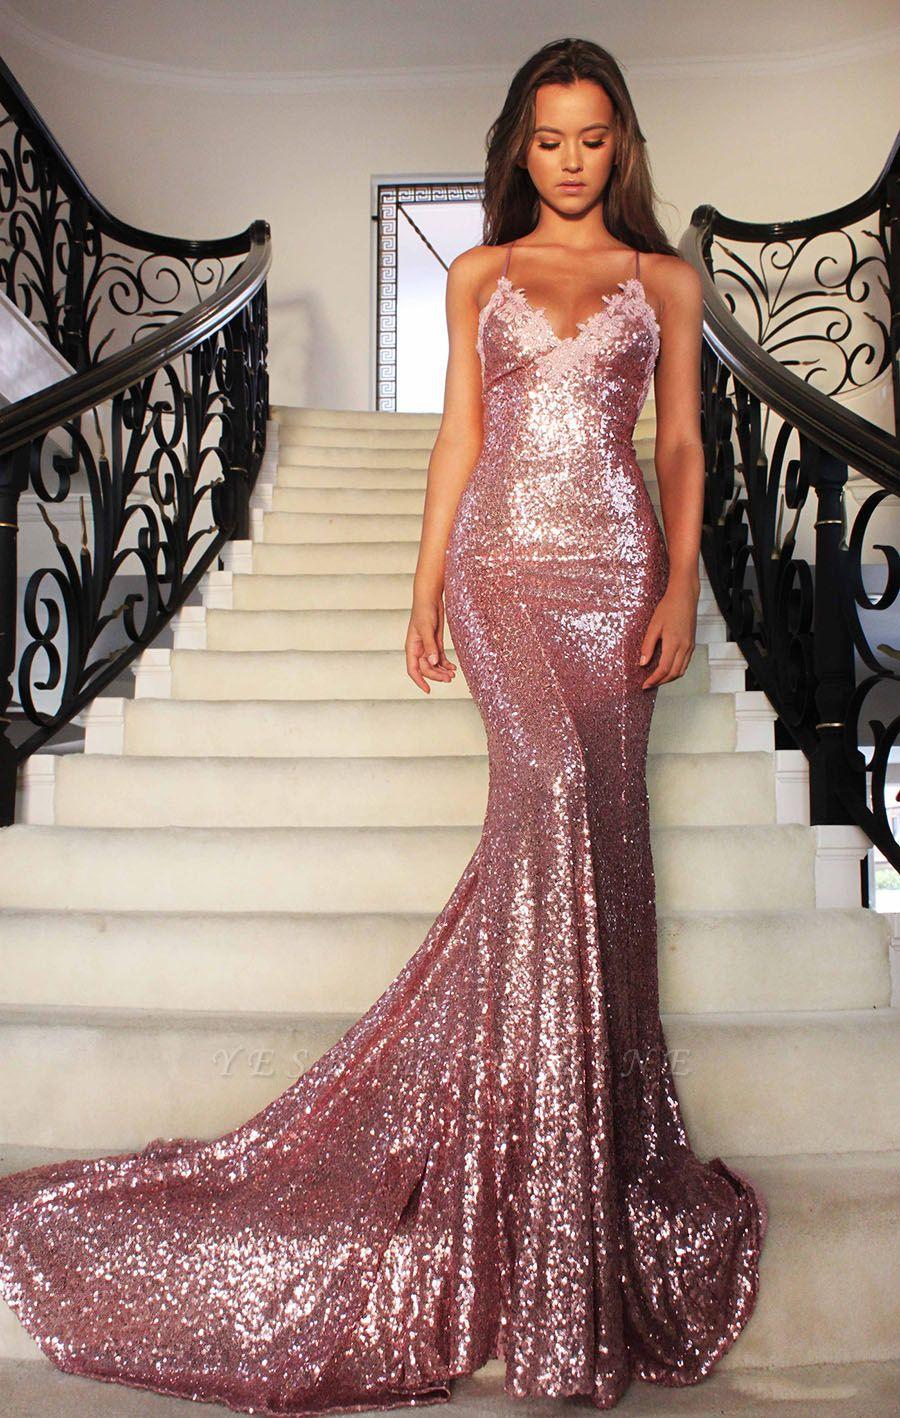 Spaghettis-Straps Rose Pink Sequins Prom Dresses | Sparkly Long Mermaid Formal Dress